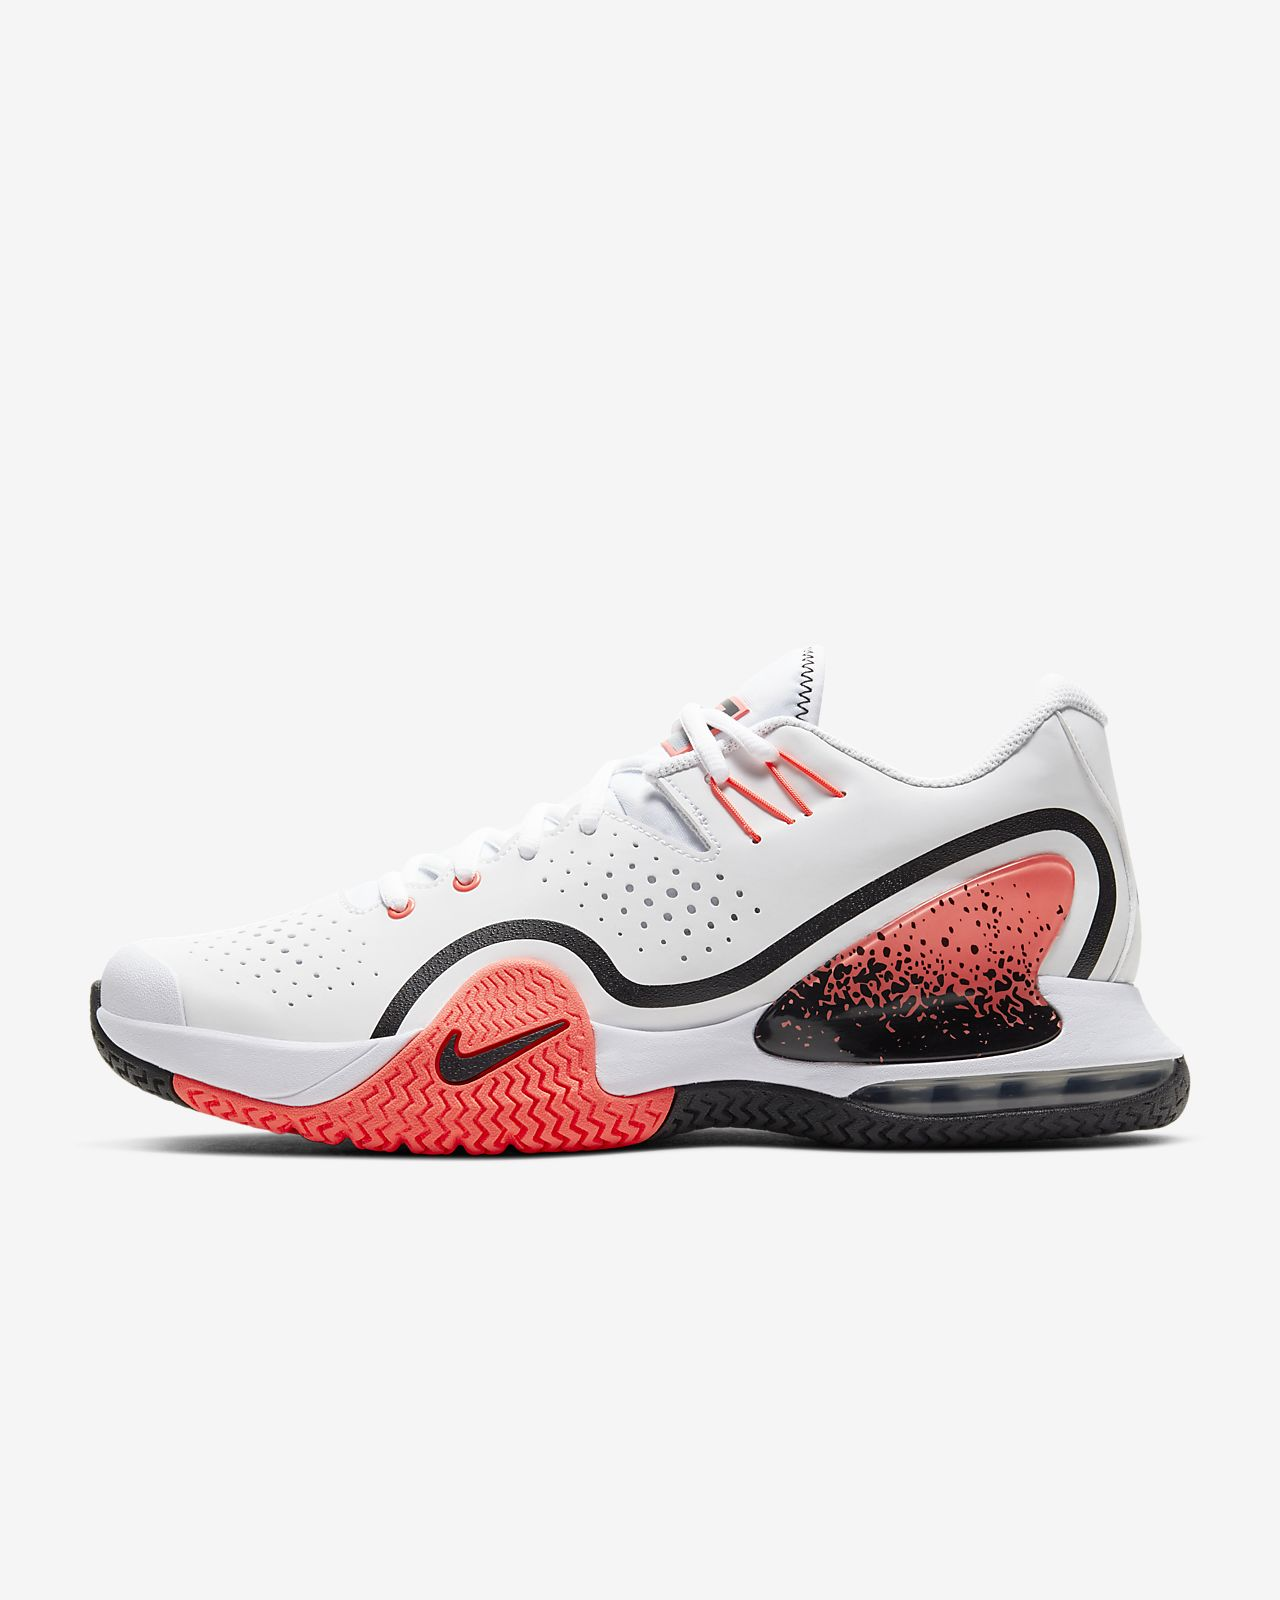 NikeCourt Tech Challenge 20 男子网球鞋